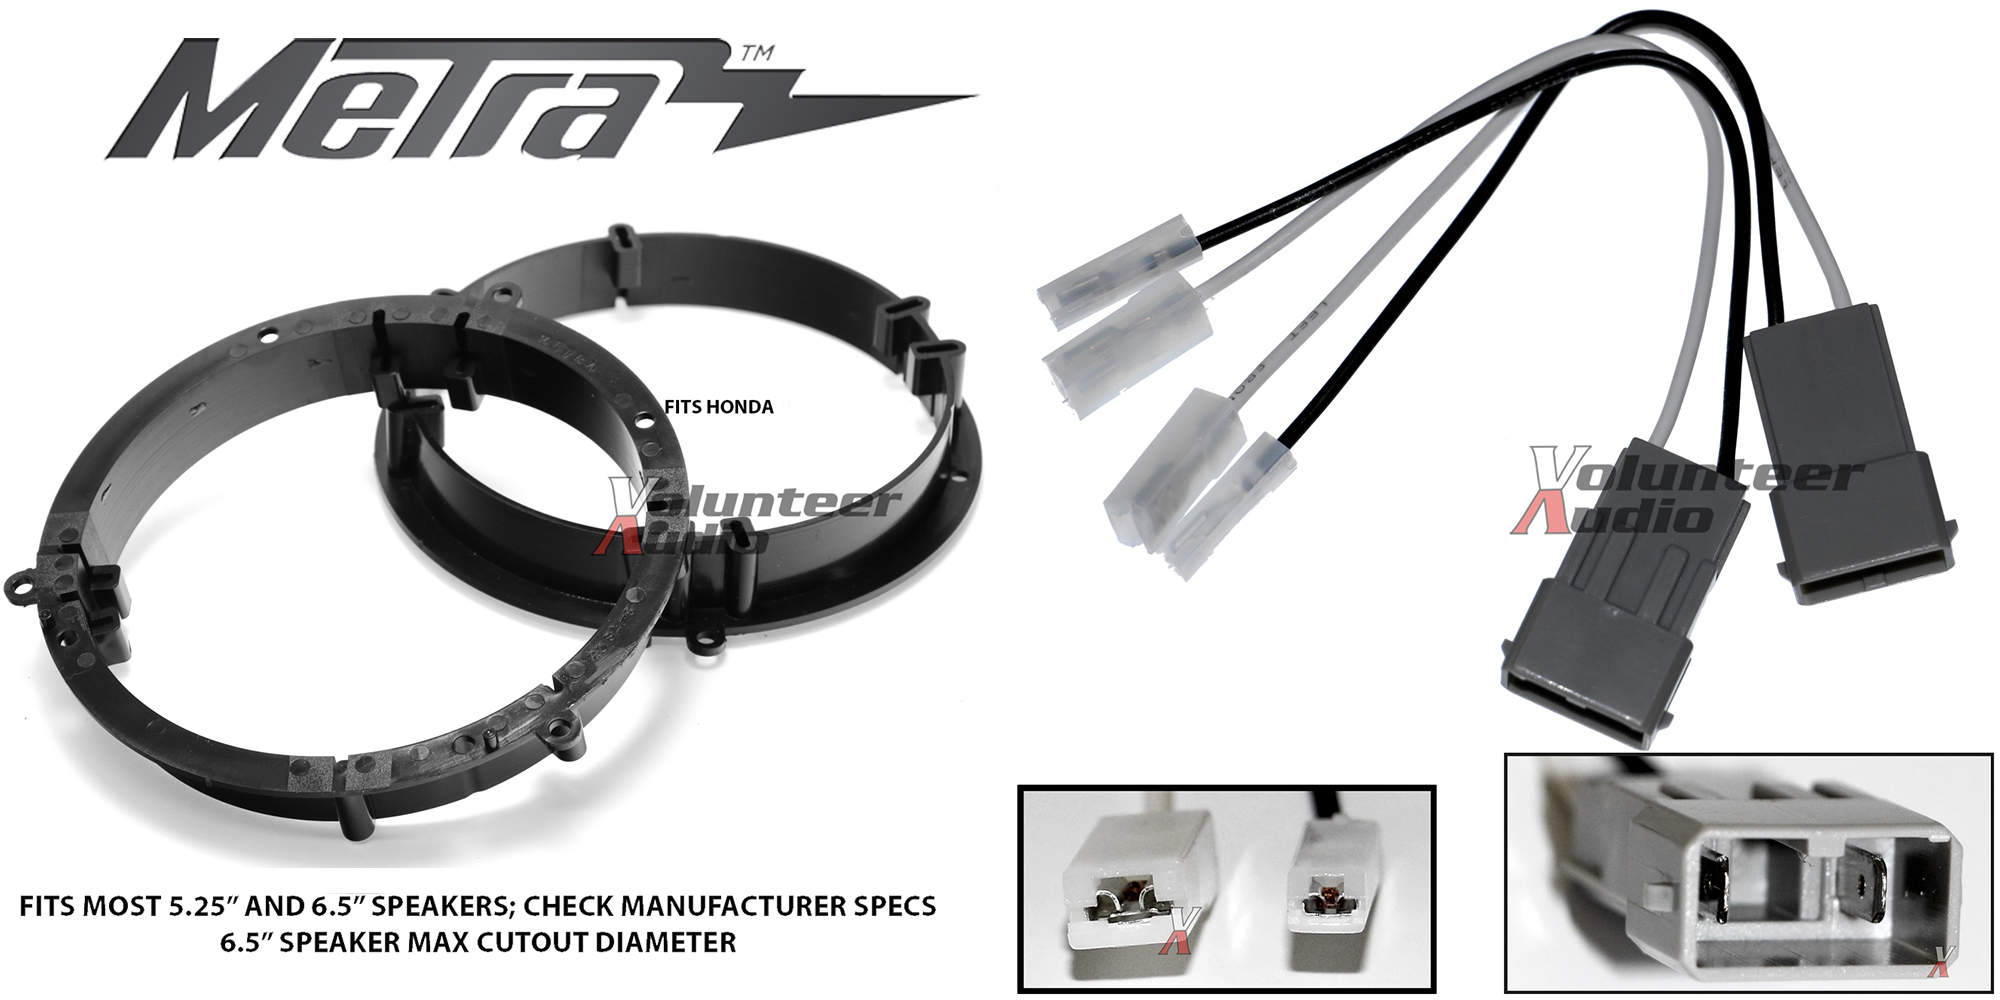 Metra 82-7803 Speaker Adapters